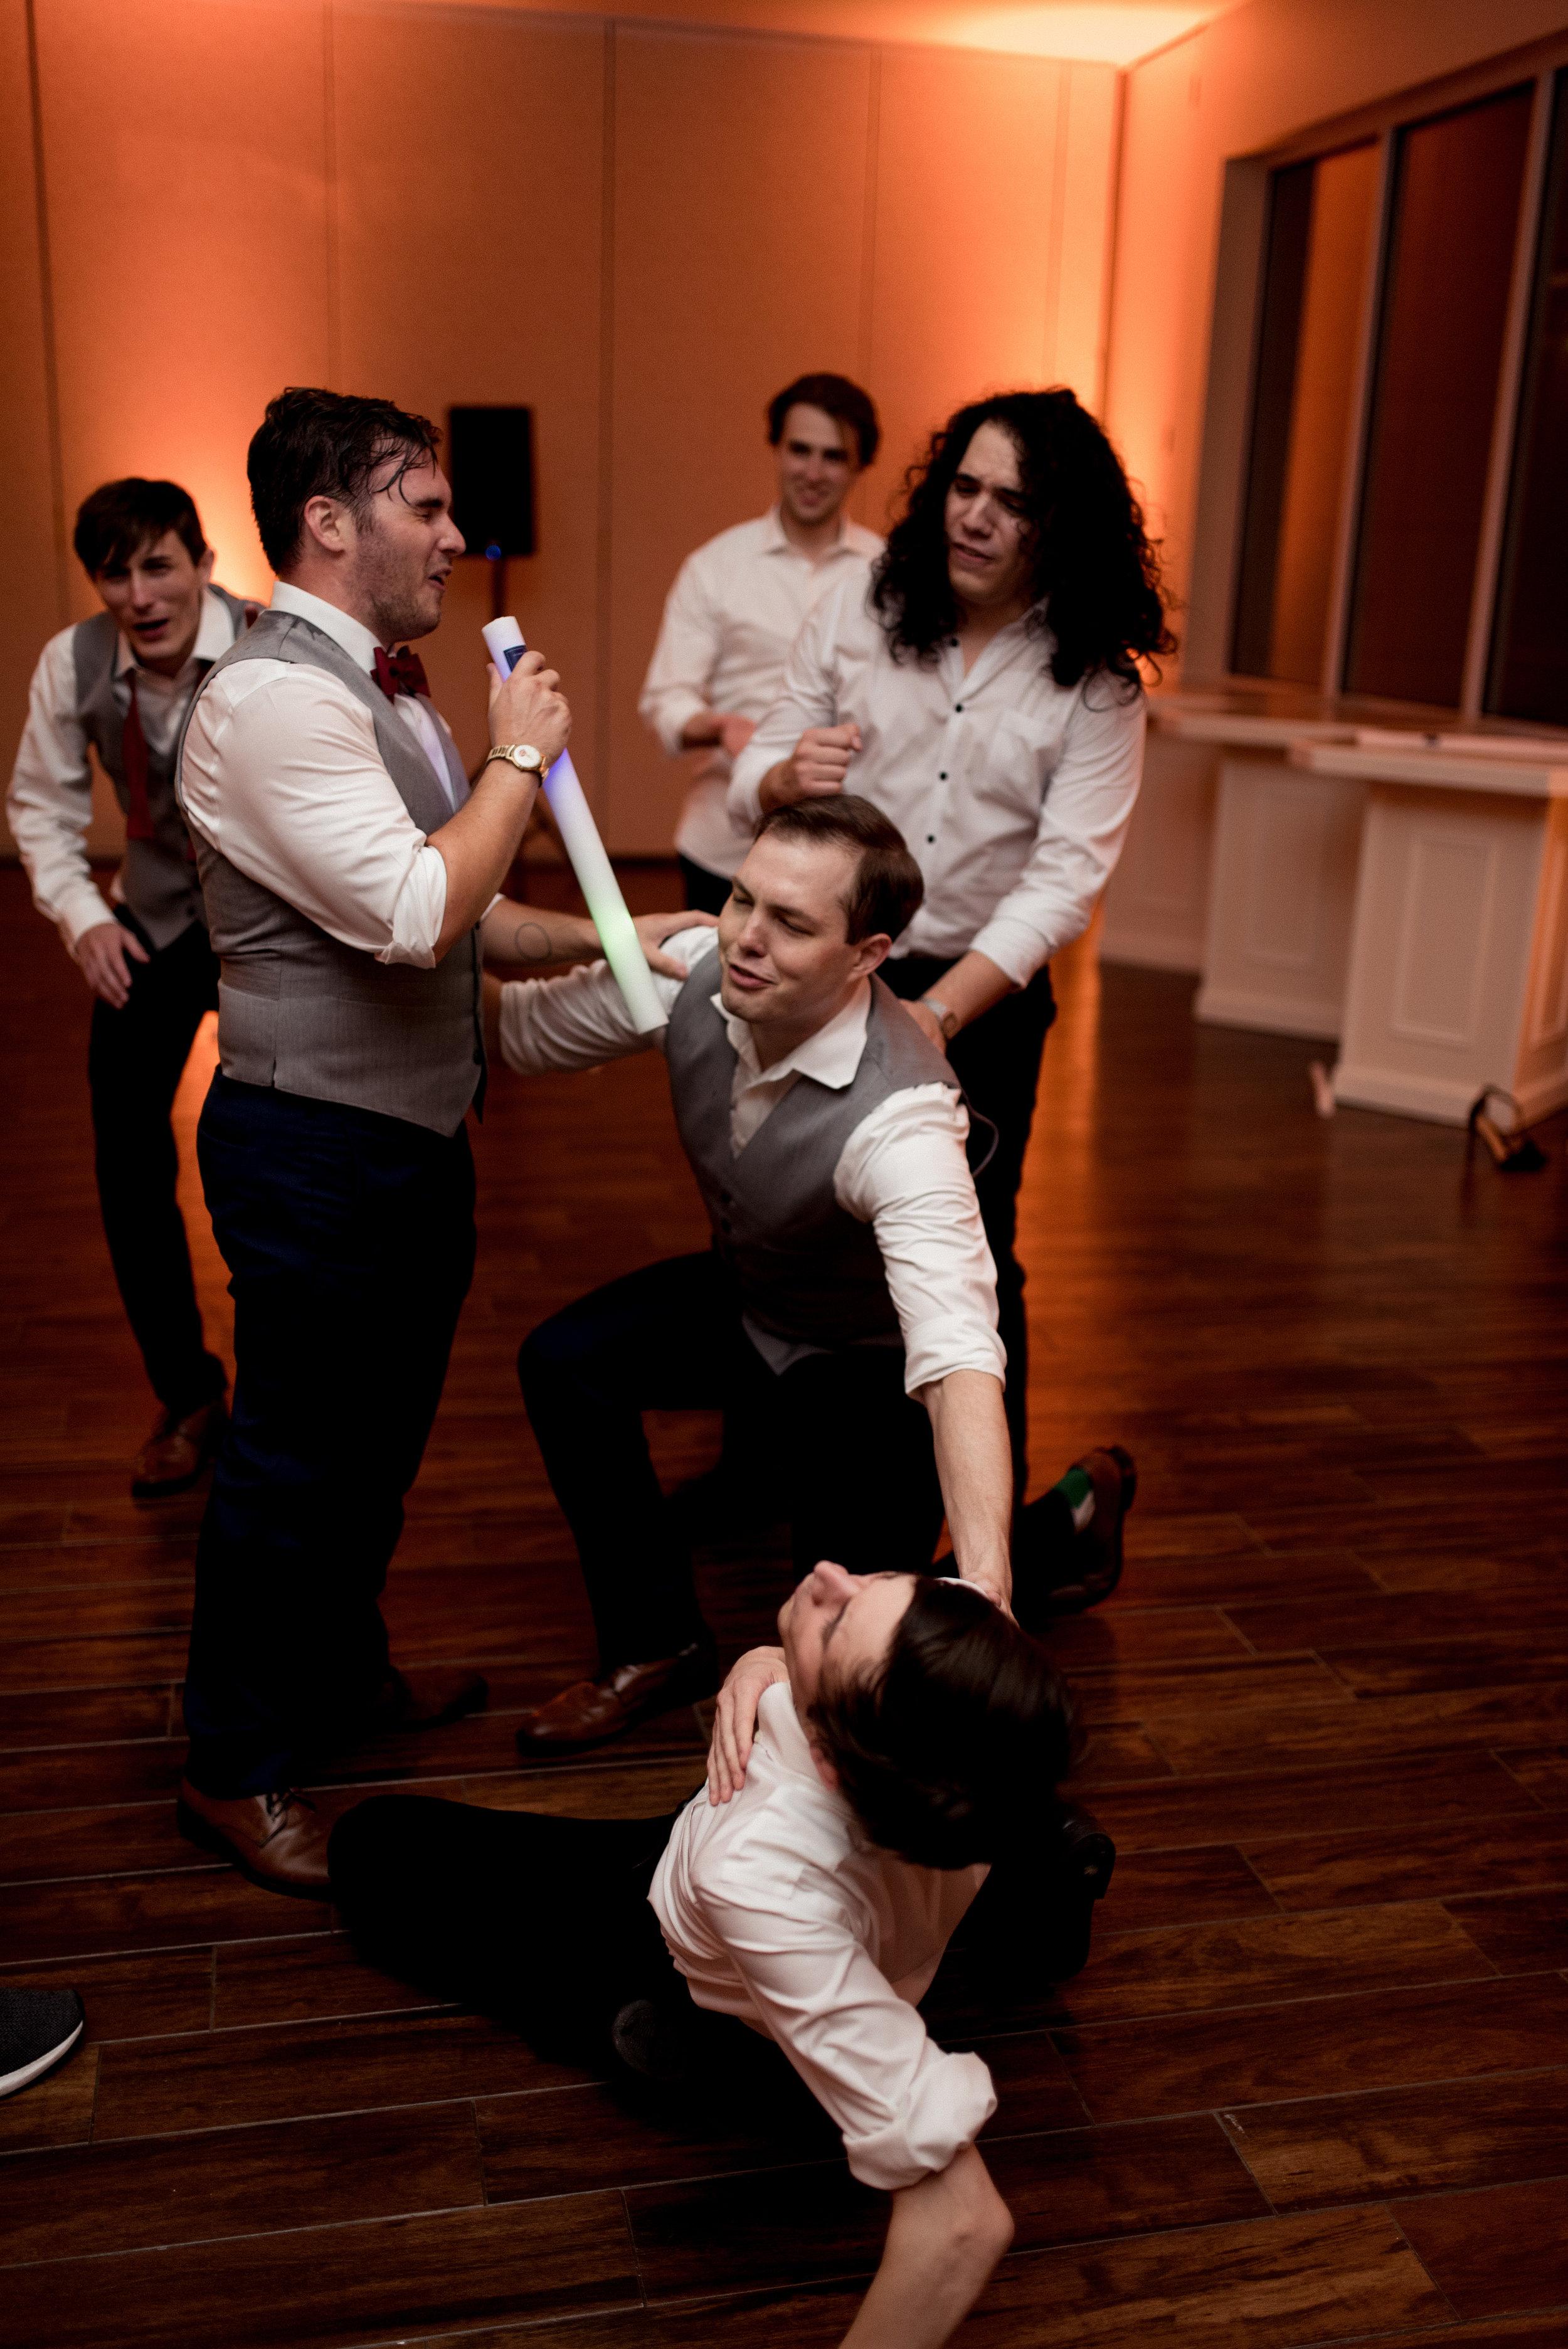 Artigues Wedding-916.jpg